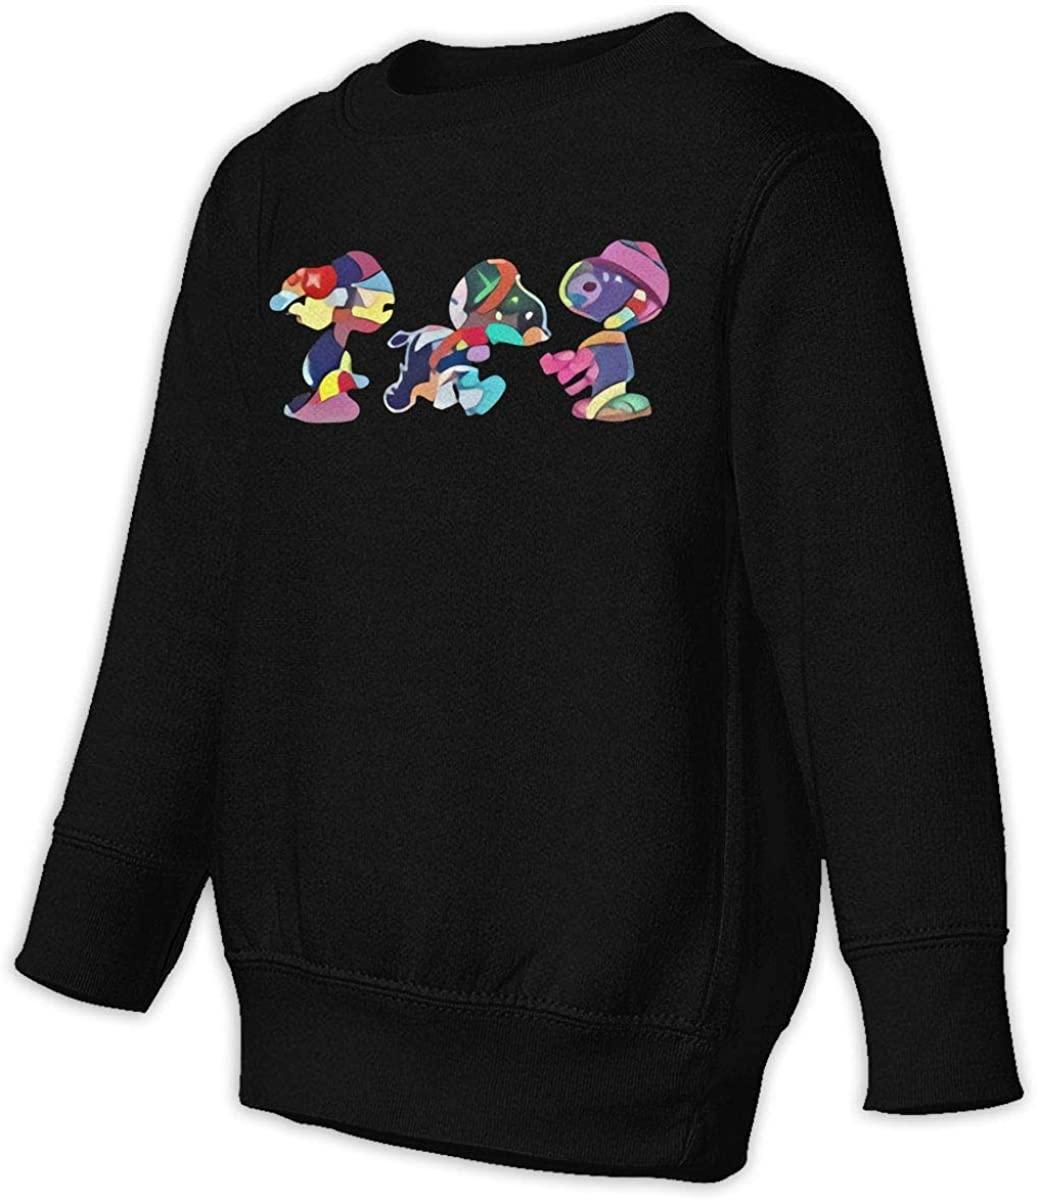 LSHLKJDFN KAWS Snoopy Set Unisex Sweatshirt Youth Boy and Girls Pullover Sweatshirt Black